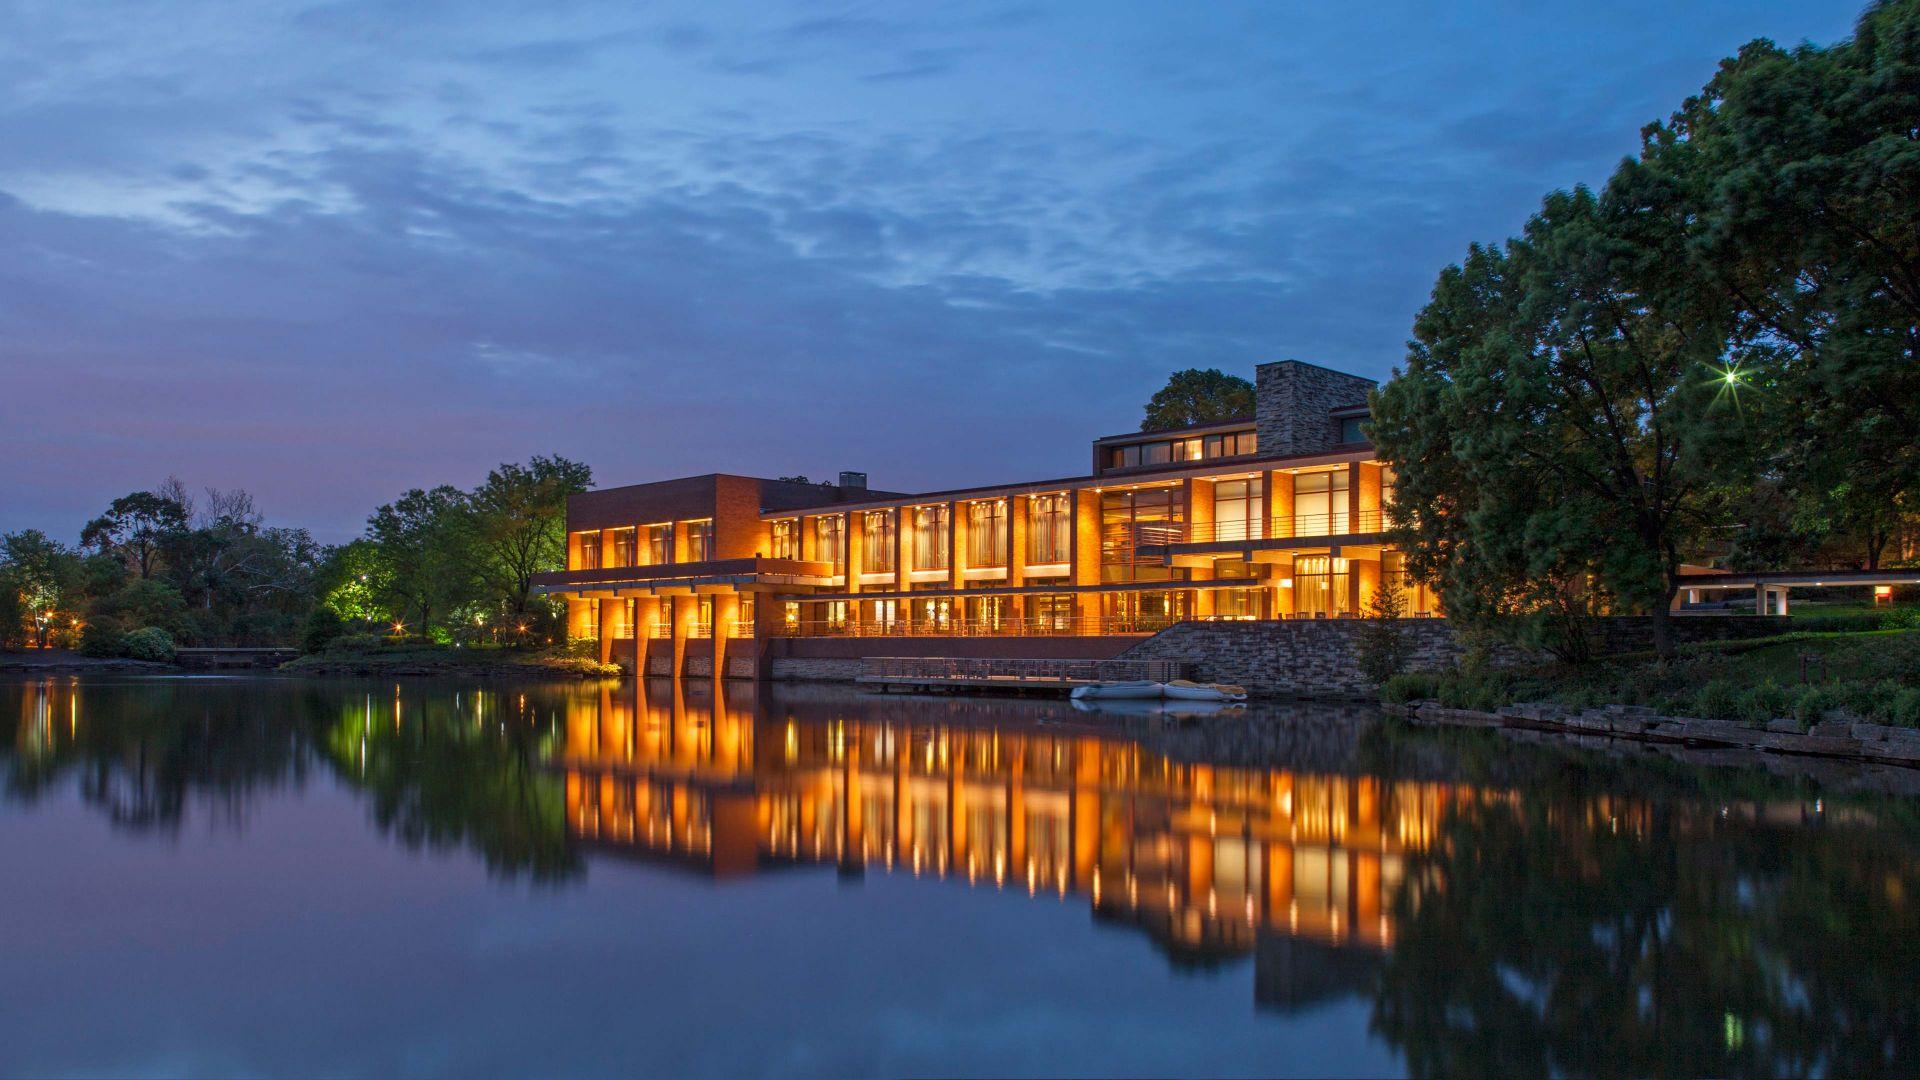 Hyatt-Lodge-McDonalds-Campus-P050-Exterior-at-Dusk.adapt.16x9.1920.1080.jpg